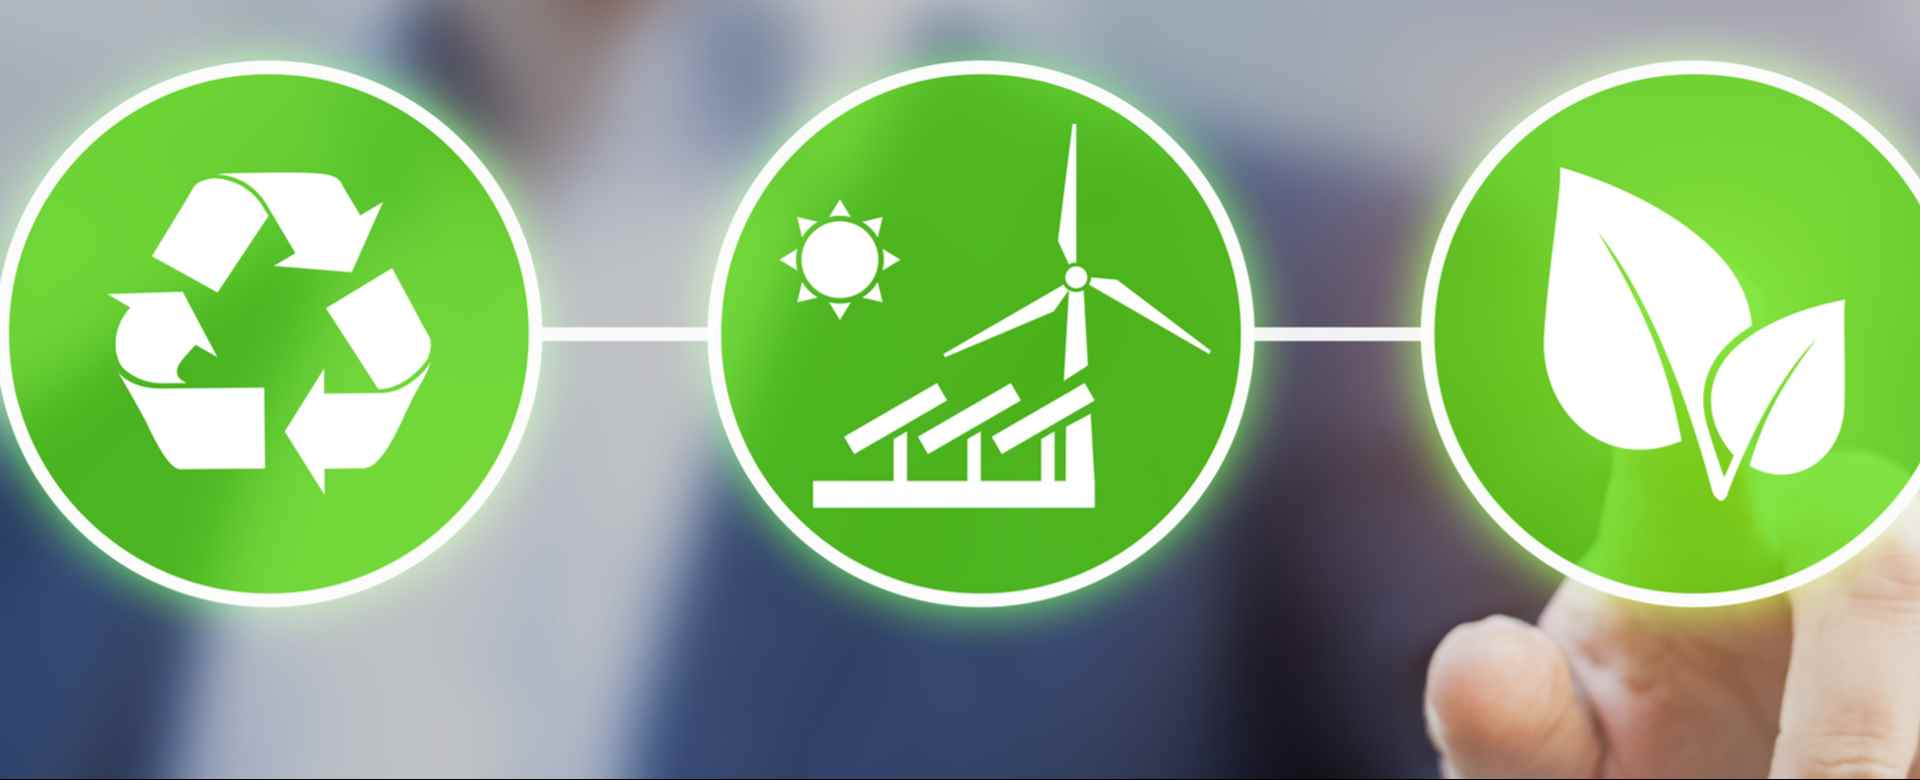 Four Ways Healthcare Organizations Can Go Green